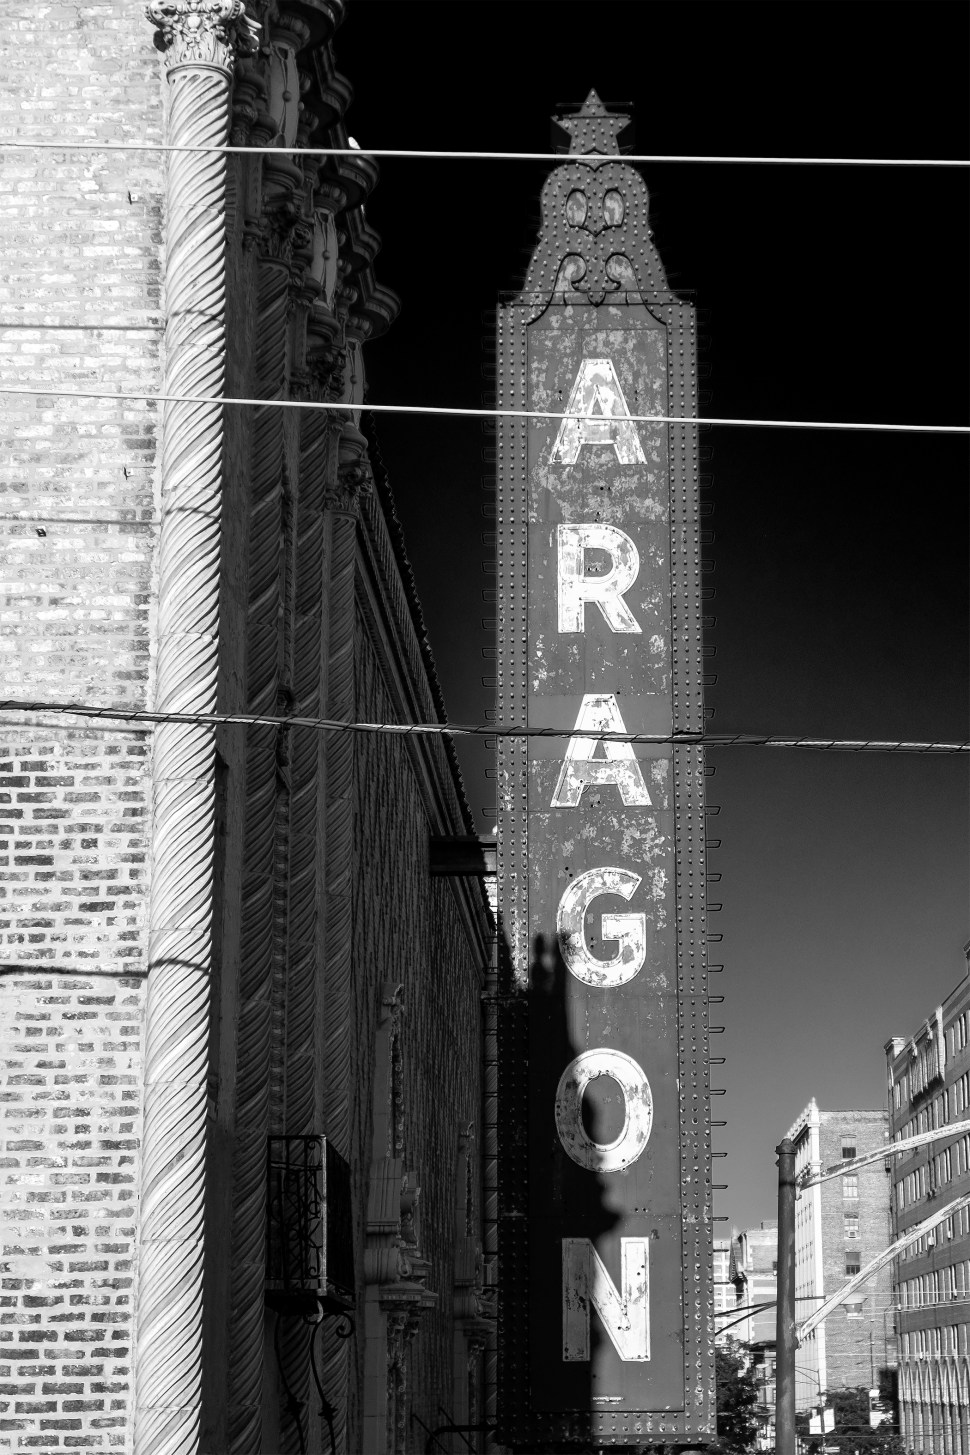 aragon_DSF7851.jpg